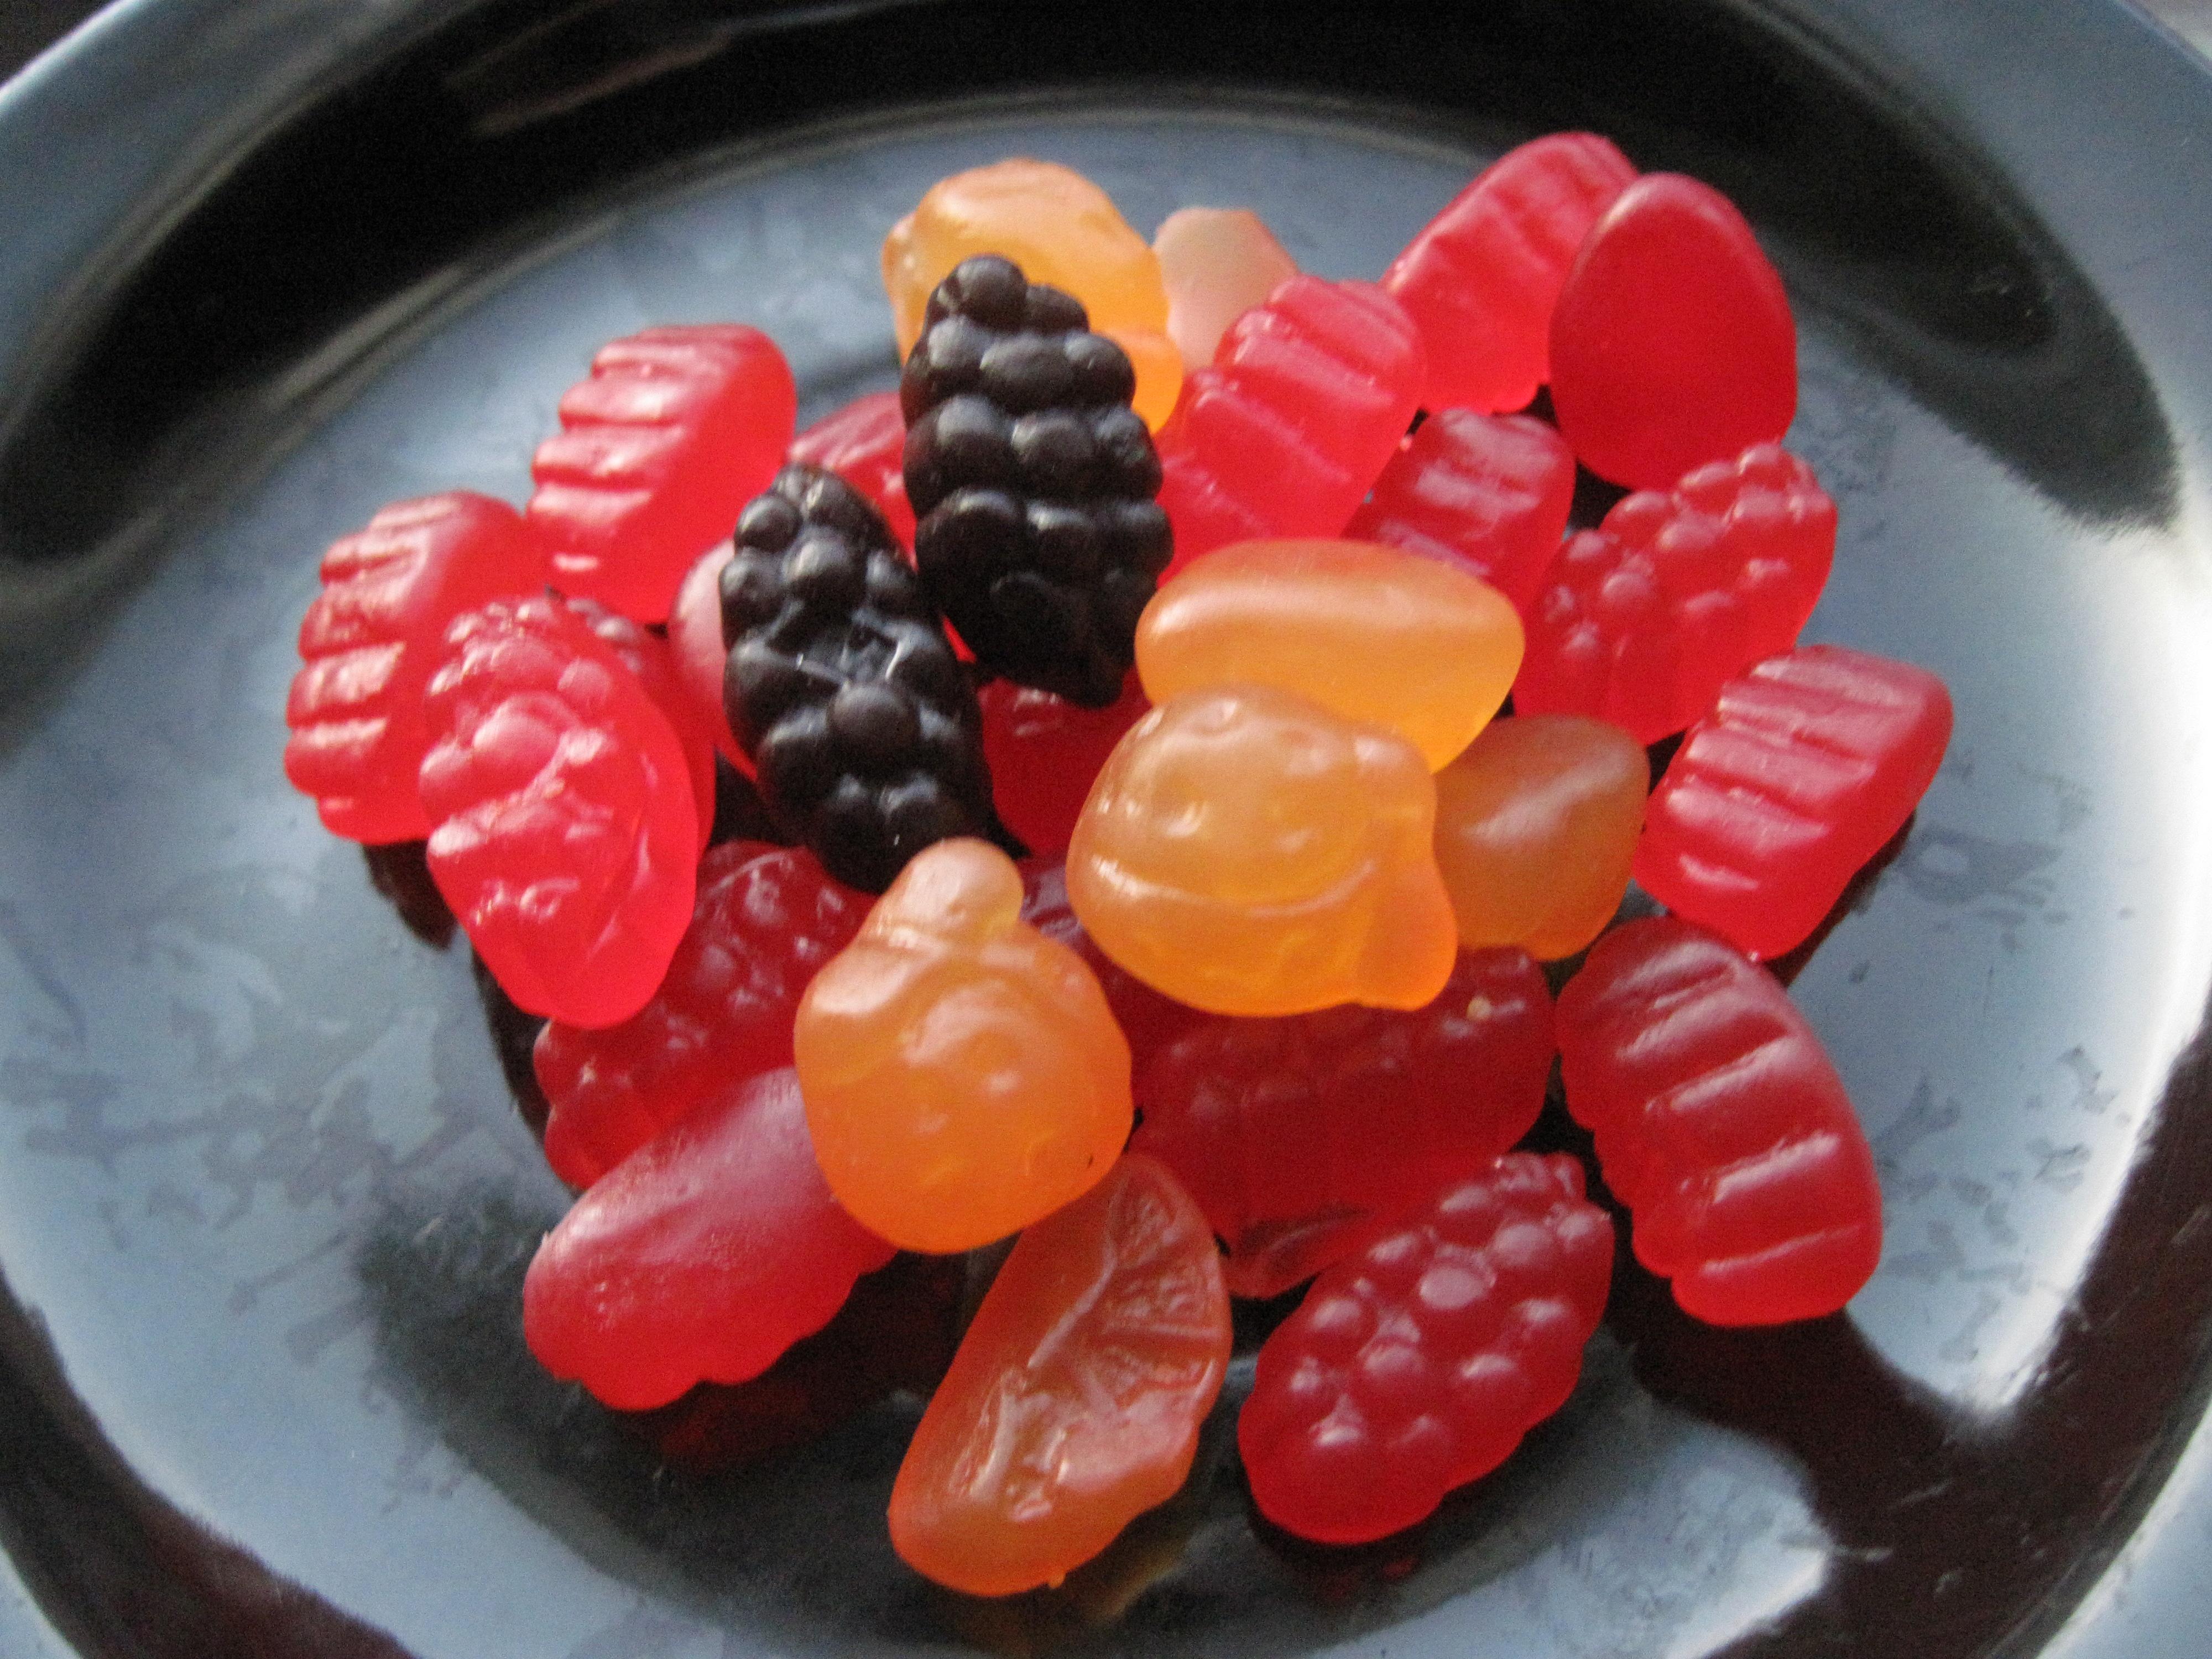 File:Welch's Fruit Snacks (4239096810).jpg - Wikimedia Commons